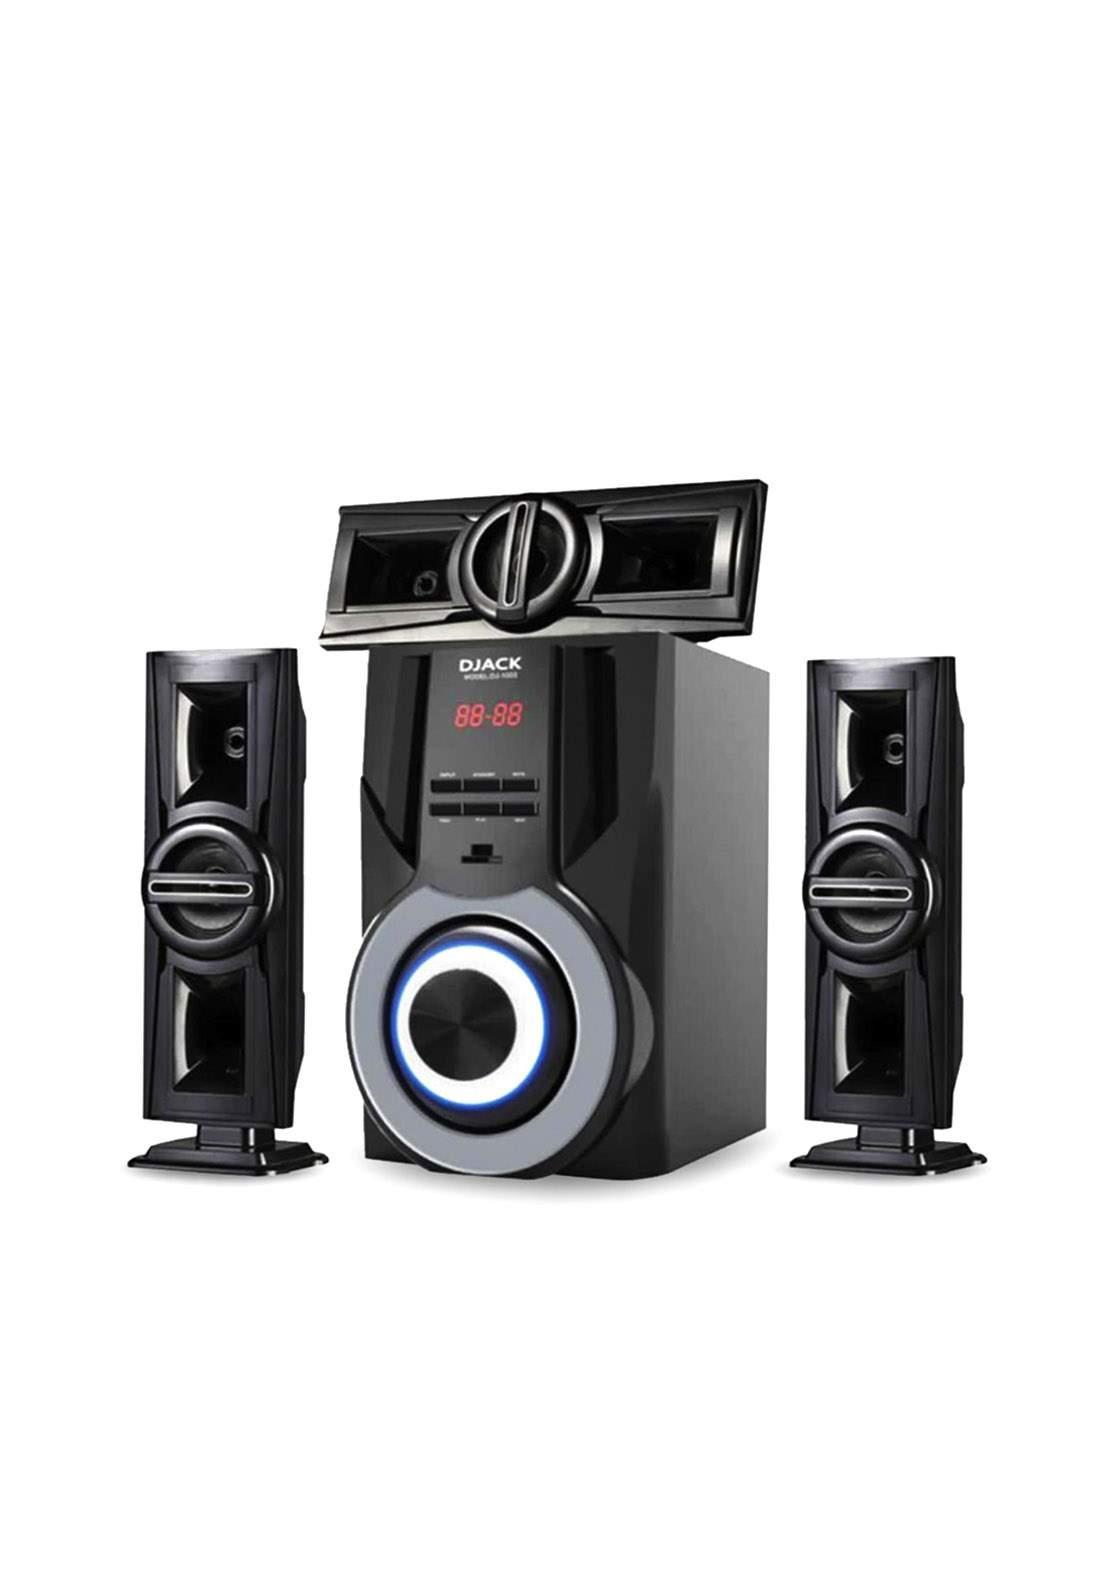 Djack E-1003 Bluetooth Home Speakers System - Black سبيكر